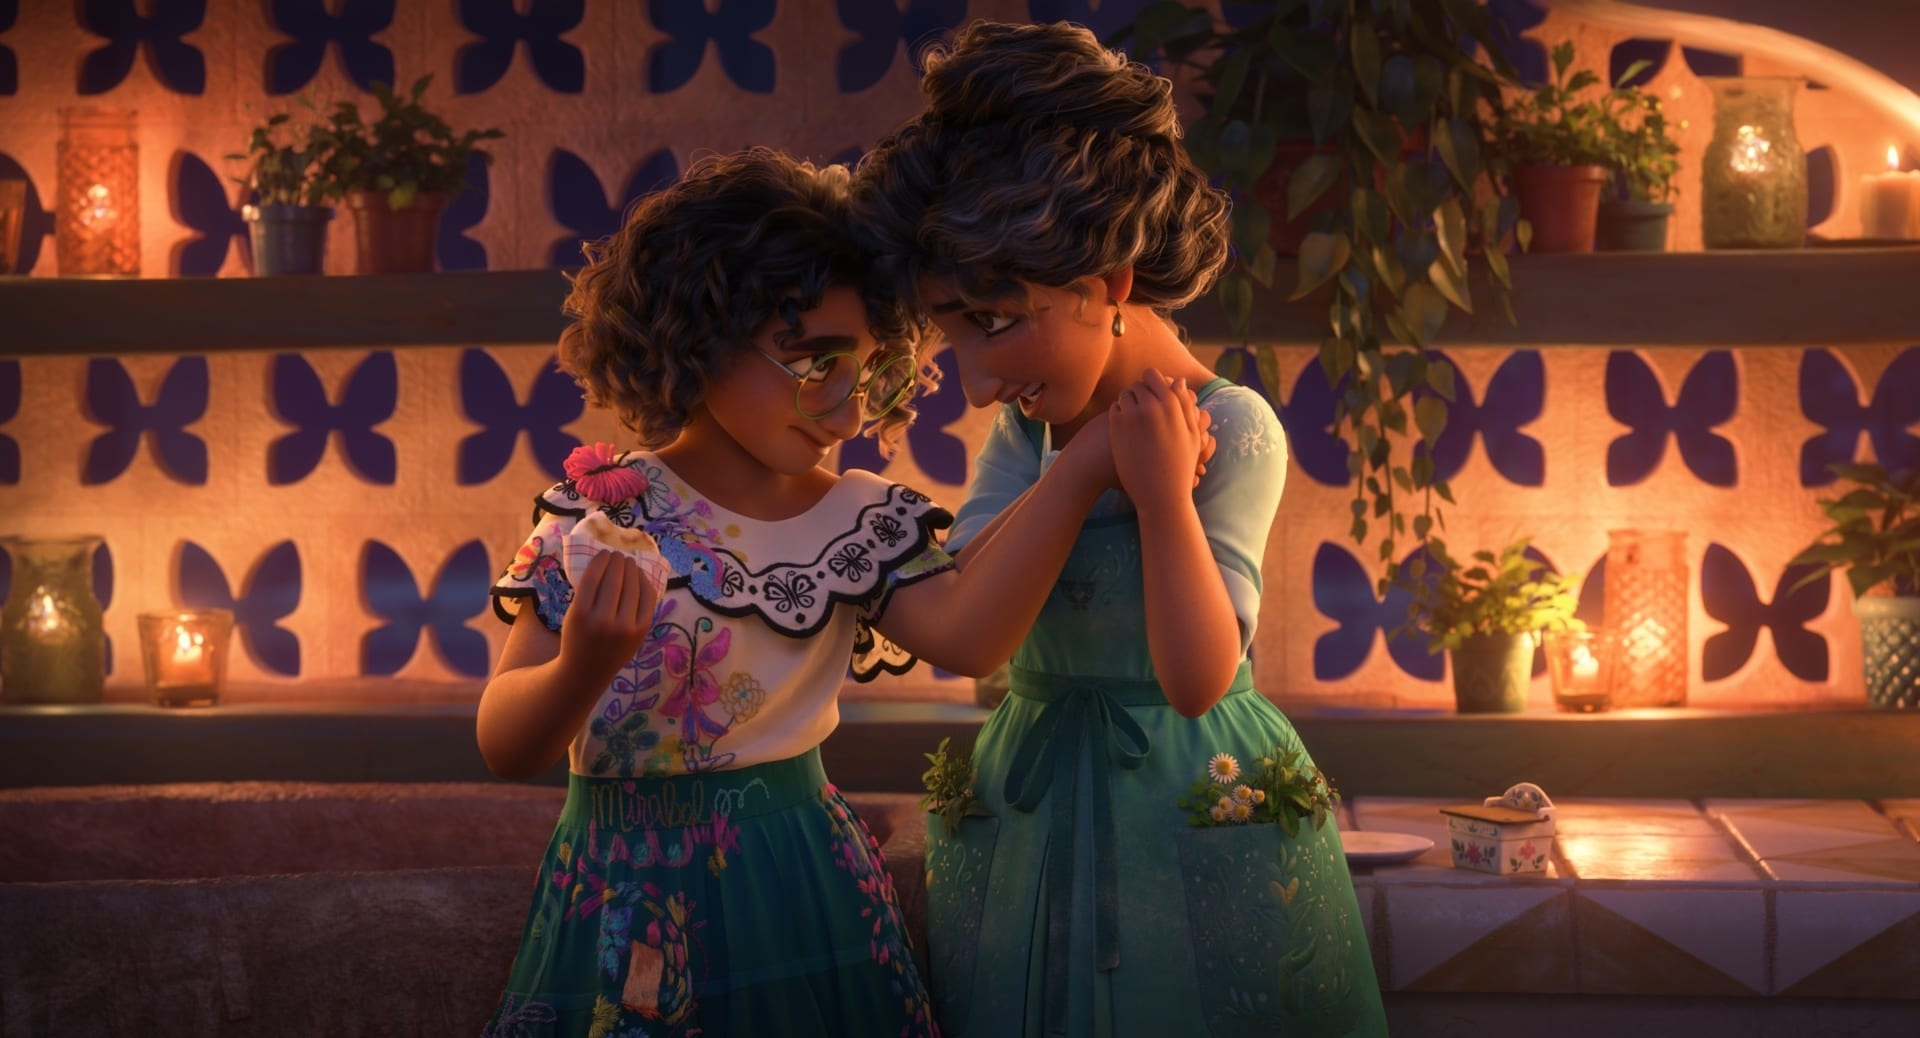 Mirabel Madrigal embraces her mom, Julieta, in Walt Disney Animation Studios' Encanto.